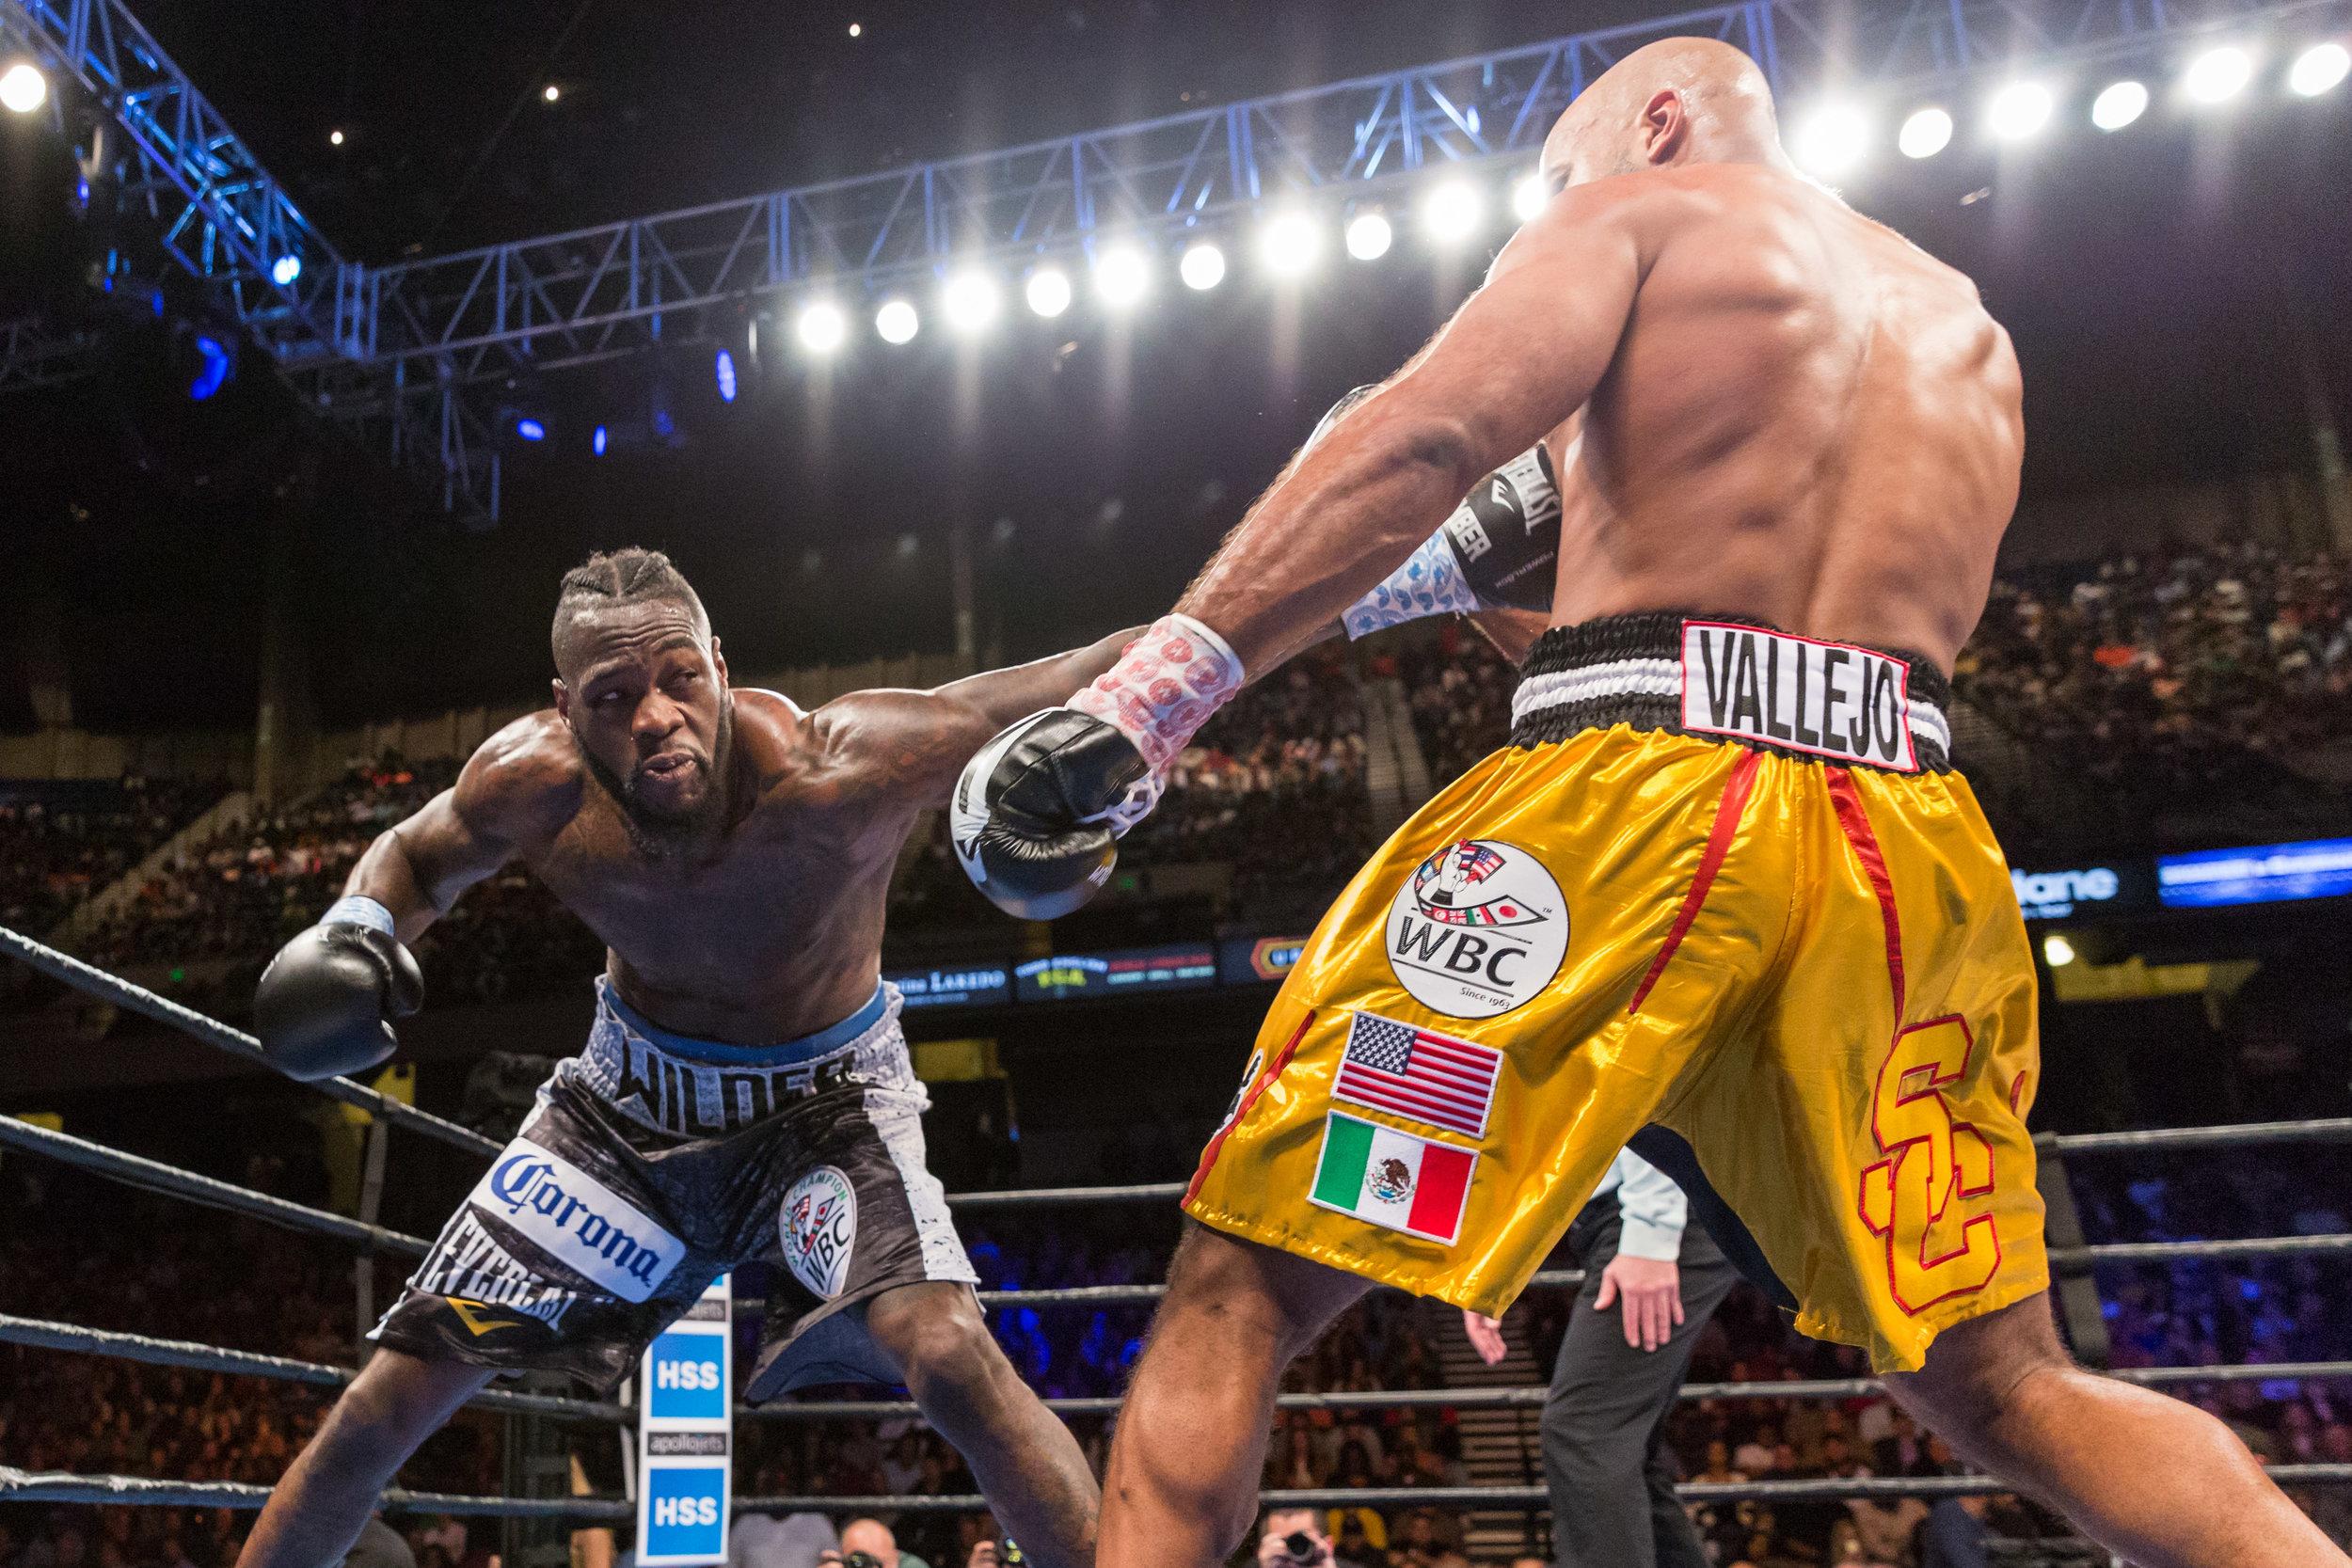 Deontay Wilder vs Gerald Washington - February 25_ 2017_02_25_2017_Fight_Ryan Hafey _ Premier Boxing Champions8.jpg